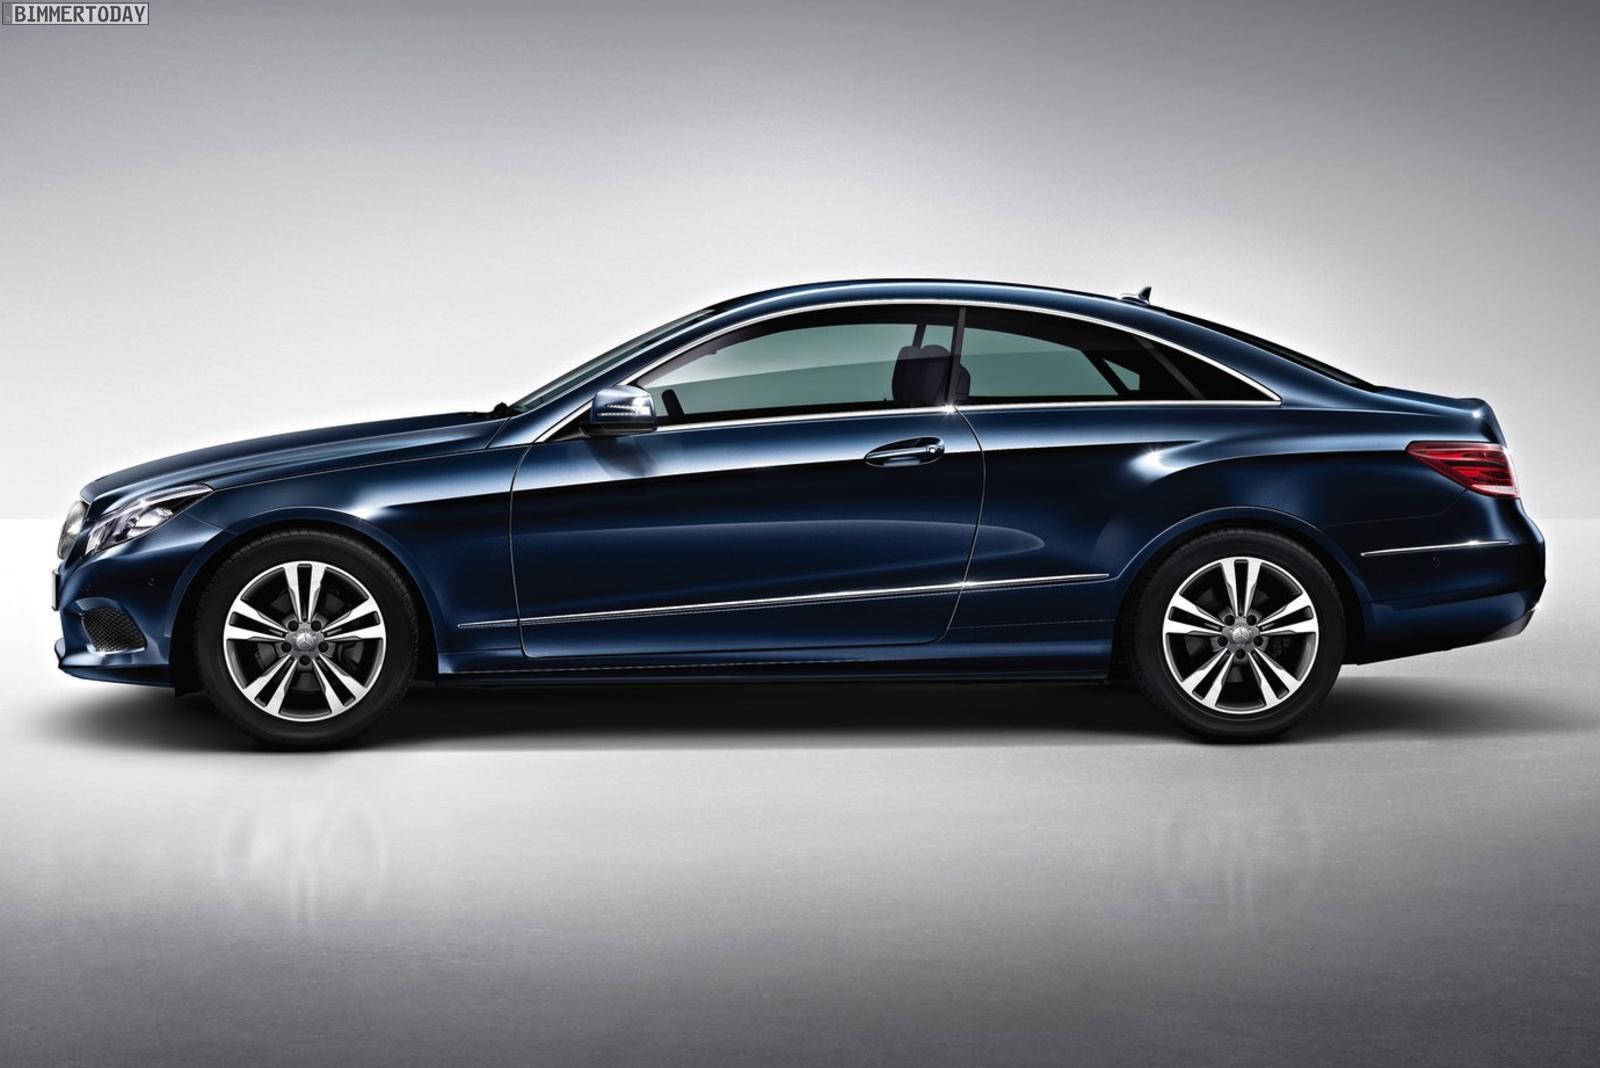 Permalink to 2013 Mercedes Benz C Class